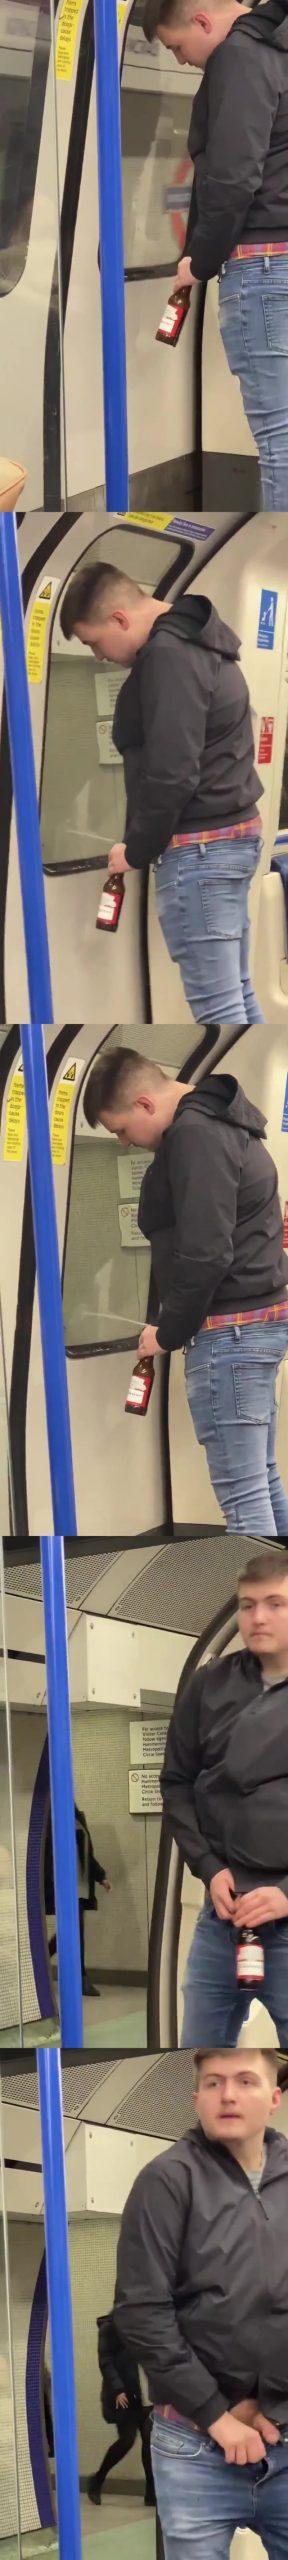 guy peeing london tube